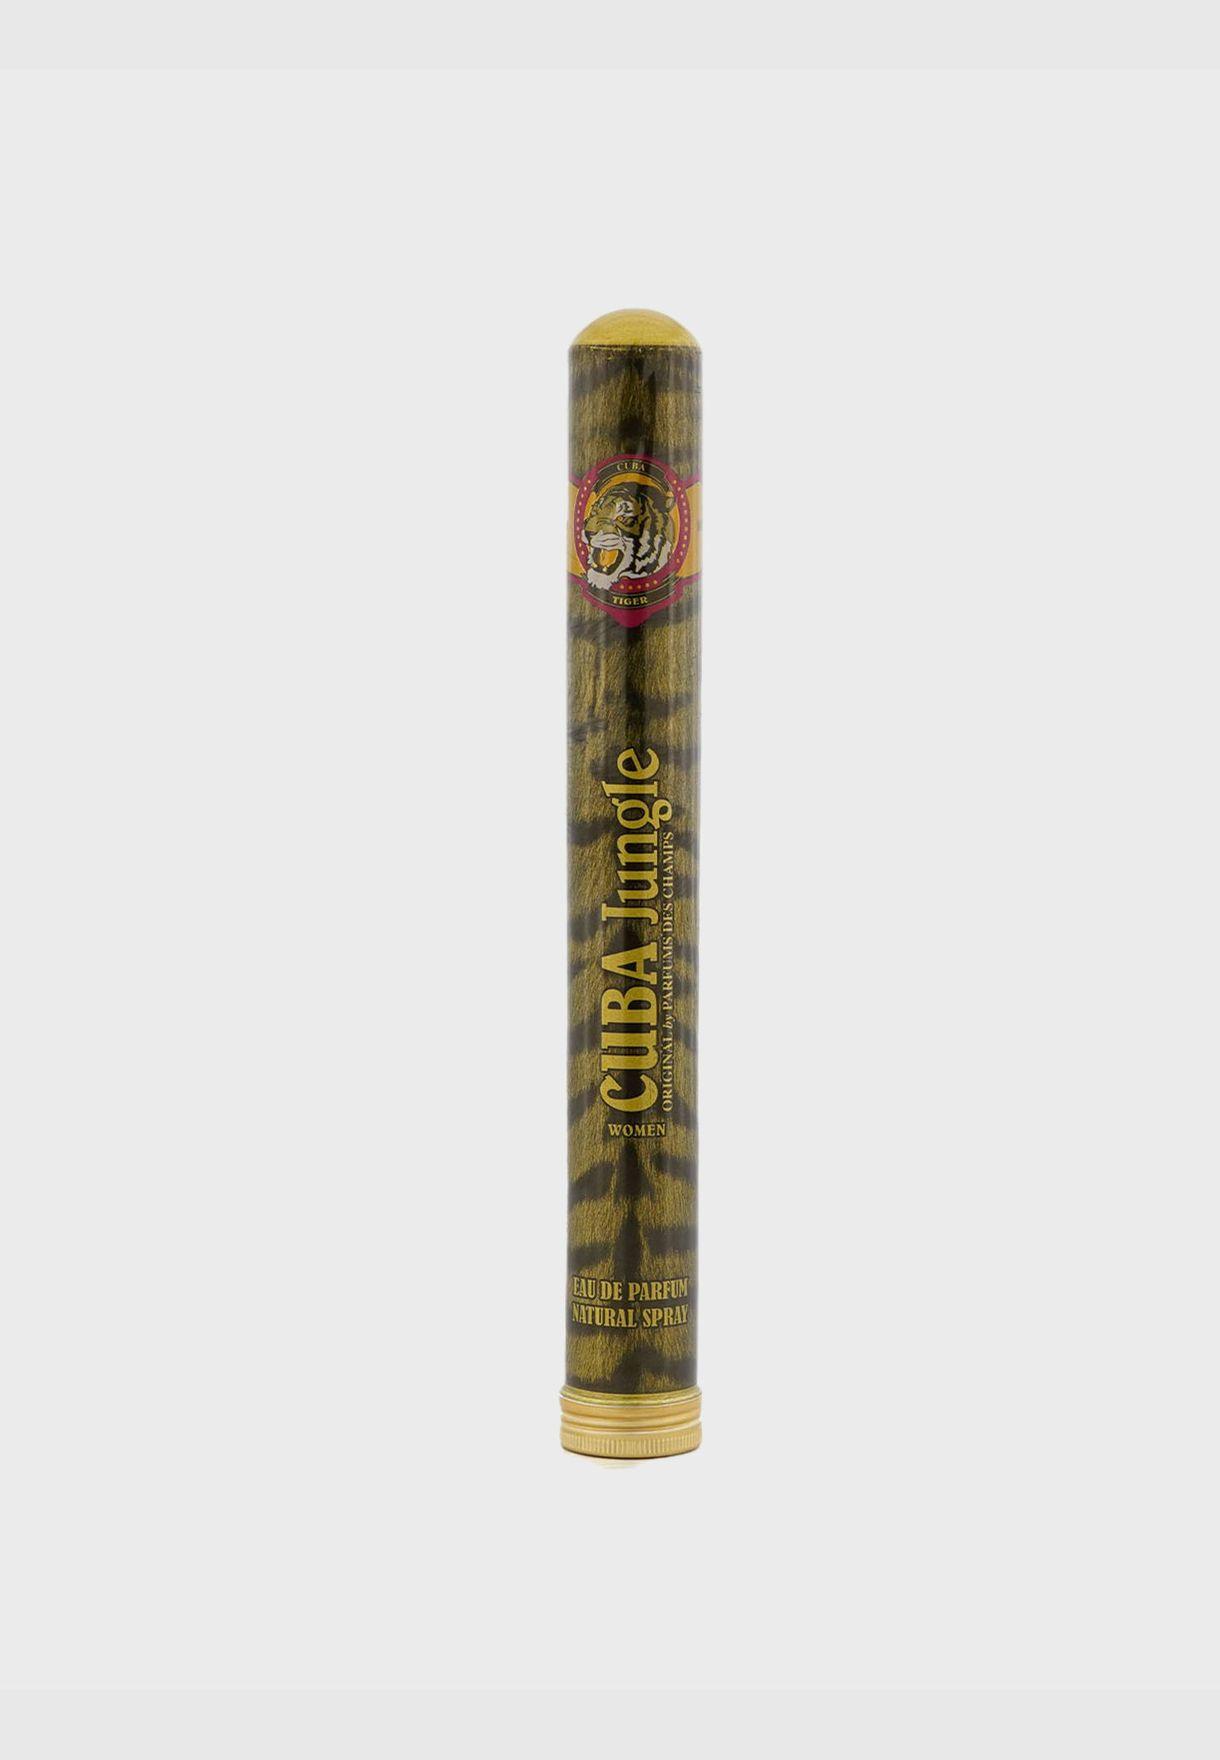 Cuba Jungle Tiger Eau De Parfum Spray